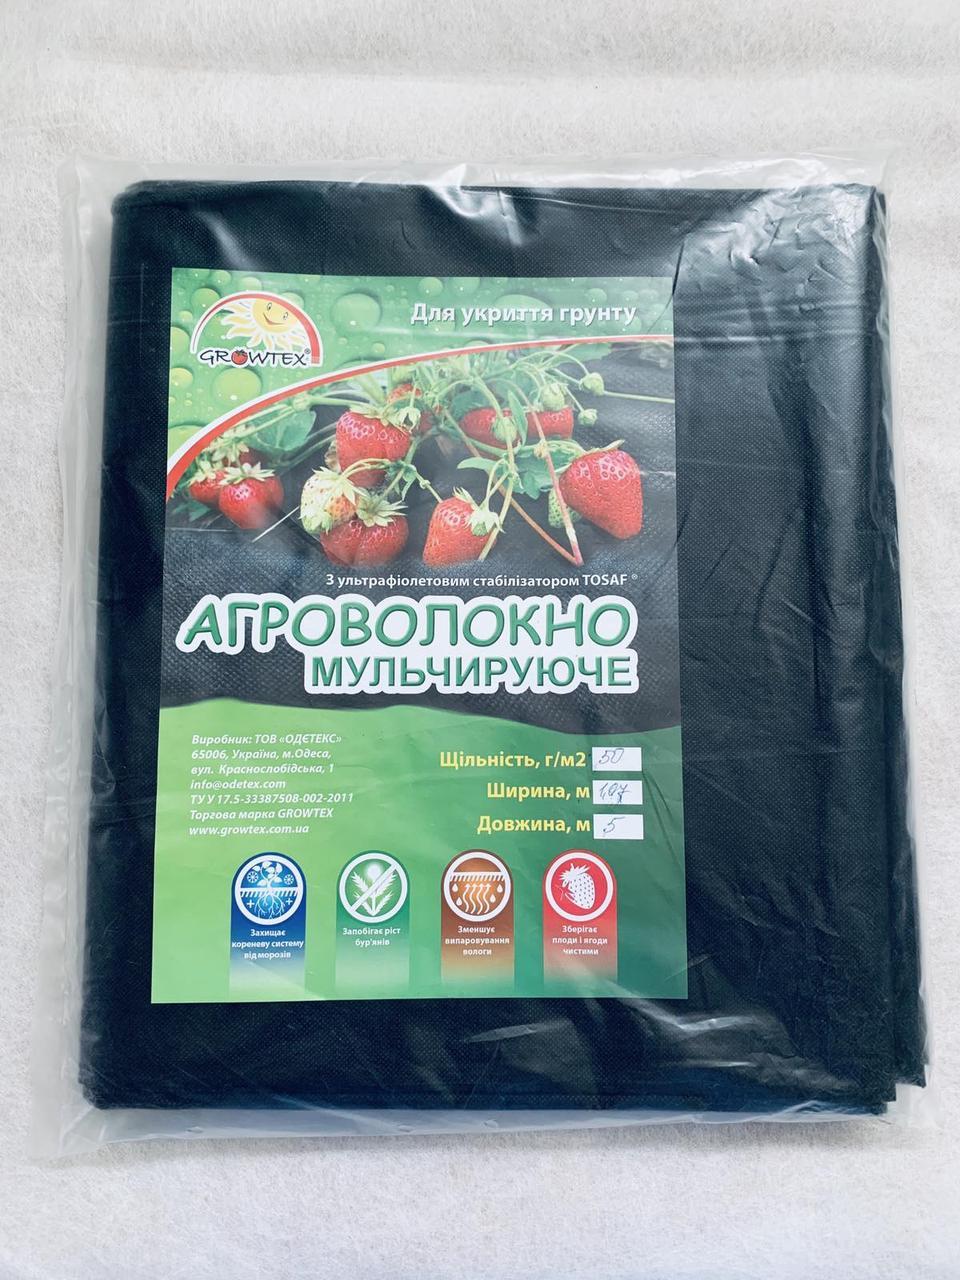 Агроволокно чорне в пакеті 50 г/м2 1,07*5 м Одетекс